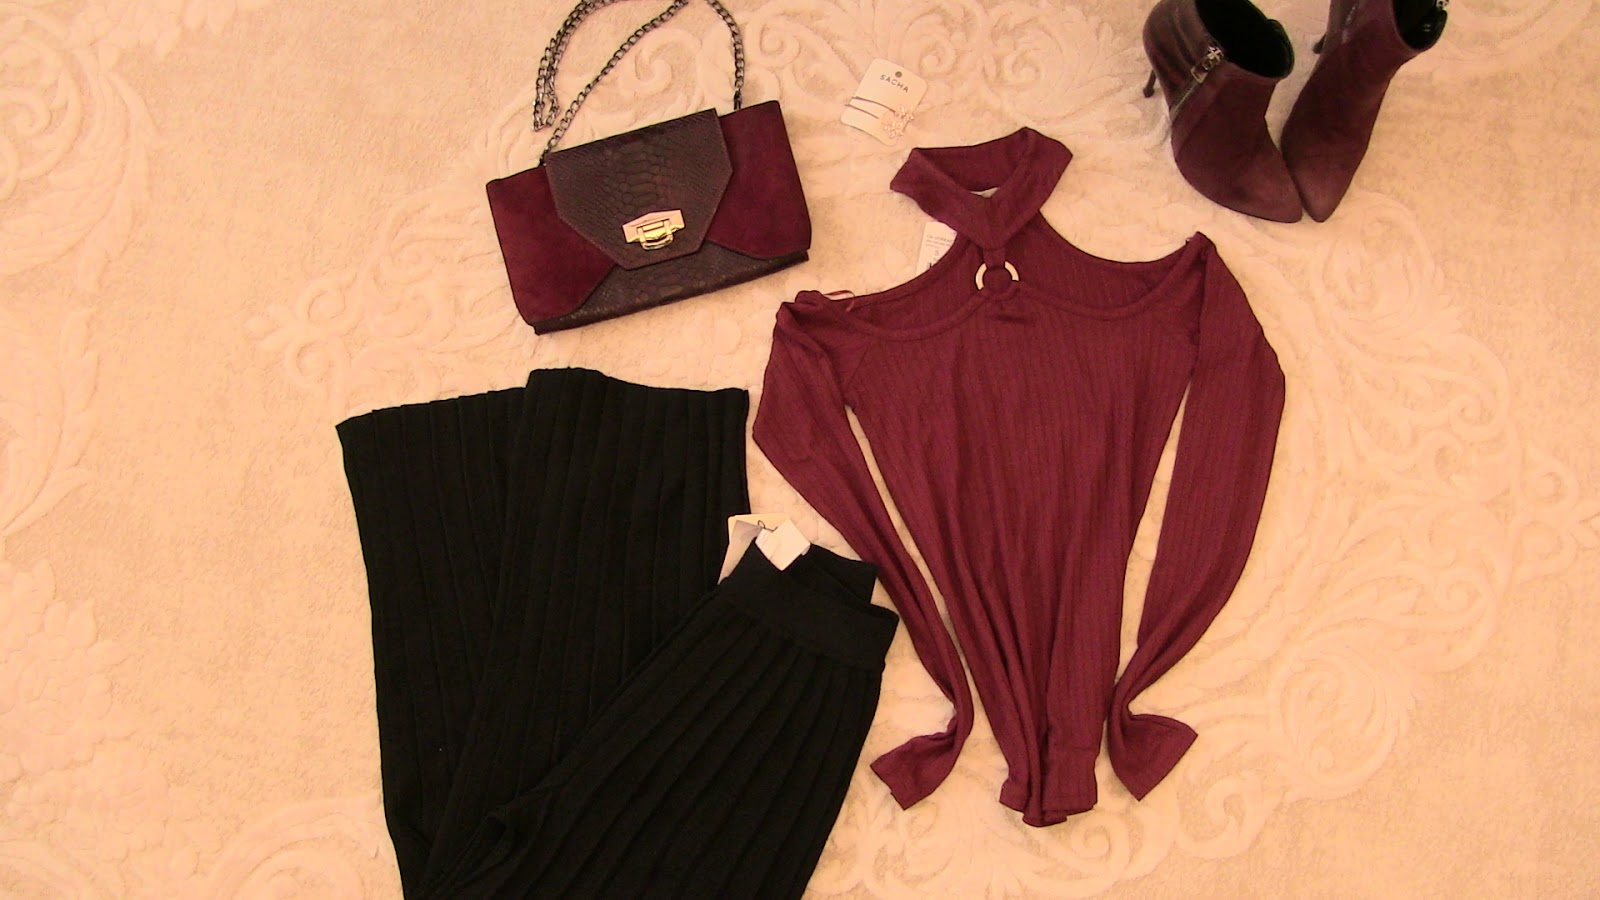 oxxo piliseli pantolon, oxxo omuz dekolteli bordo bluz, hotiç çanta ve bot